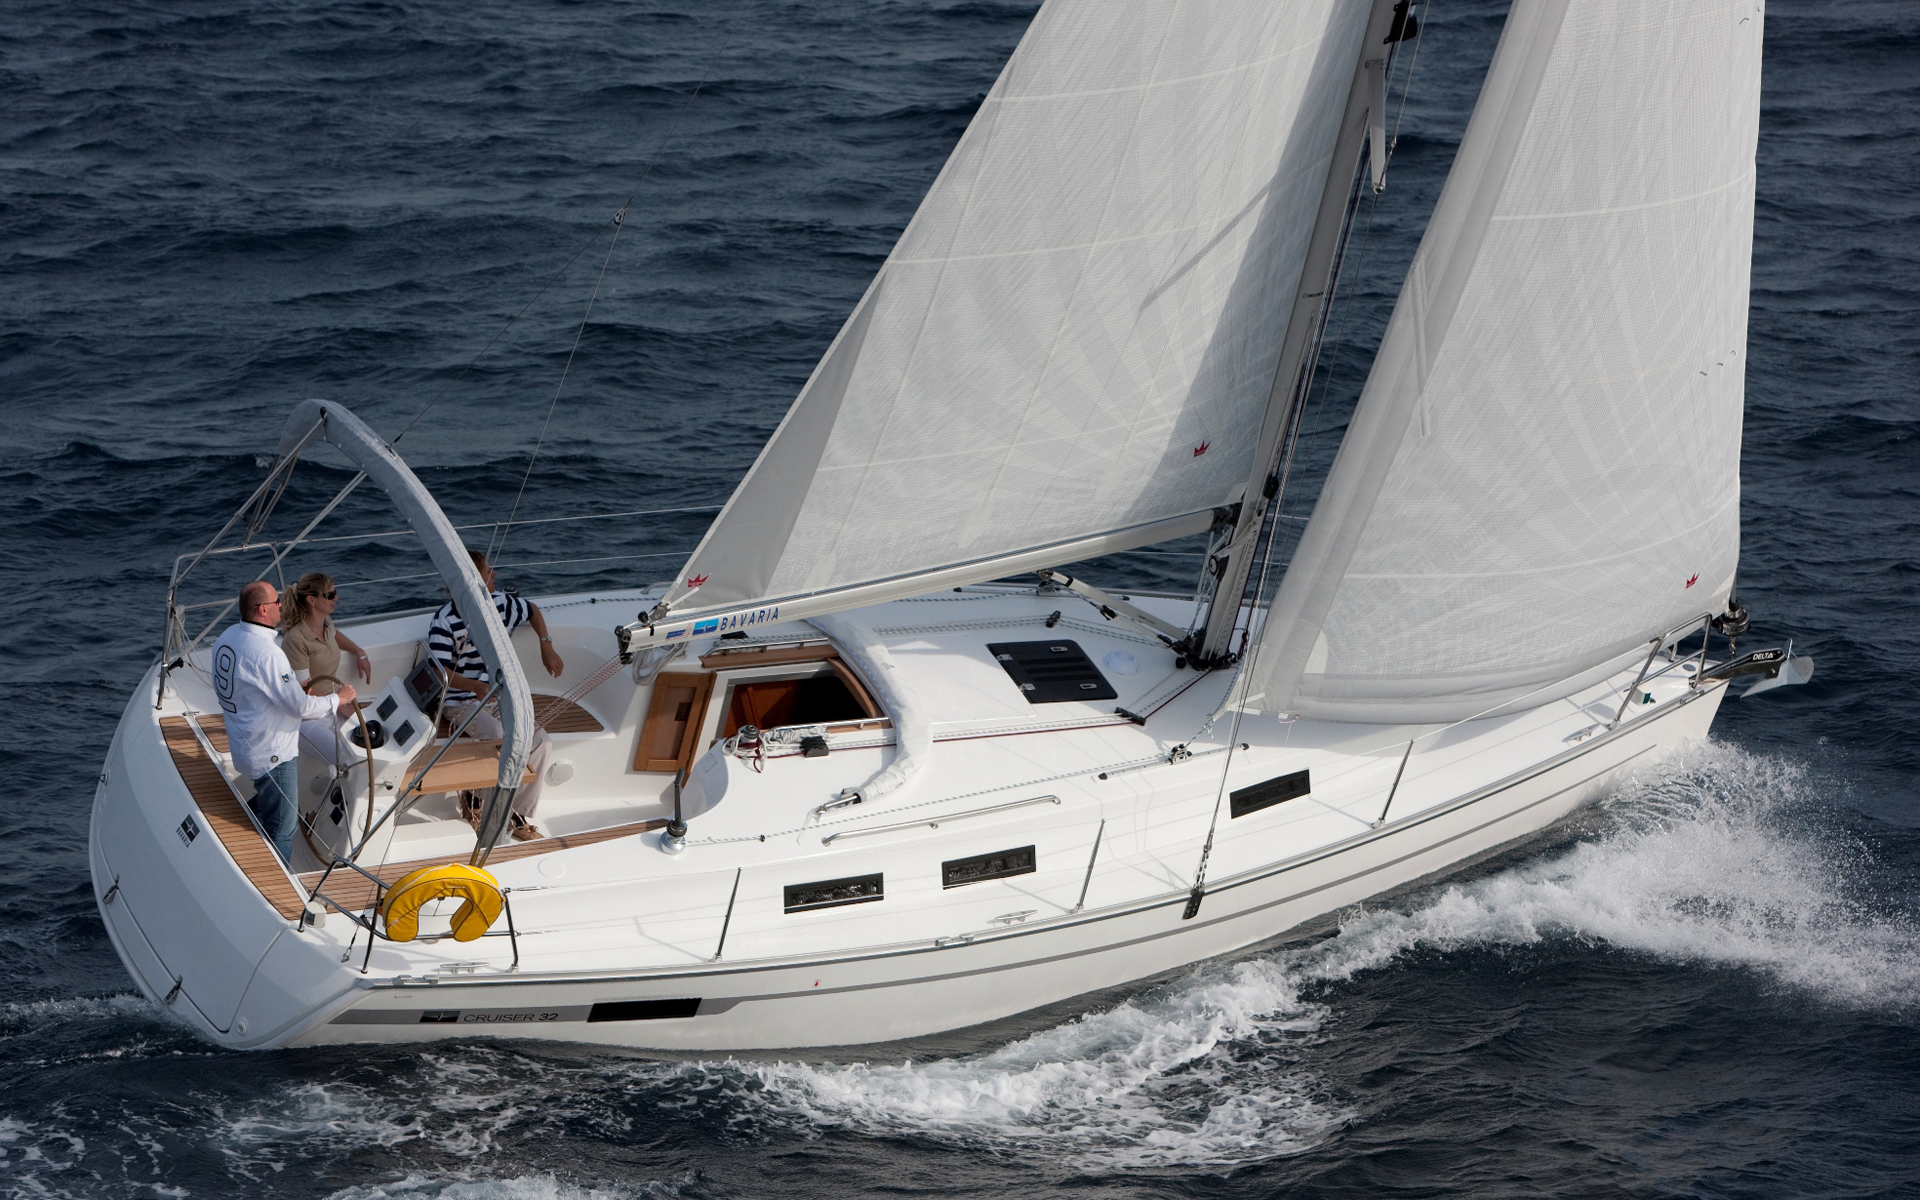 Moderne segelyachten  Moderner Yachtbau – Wikipedia